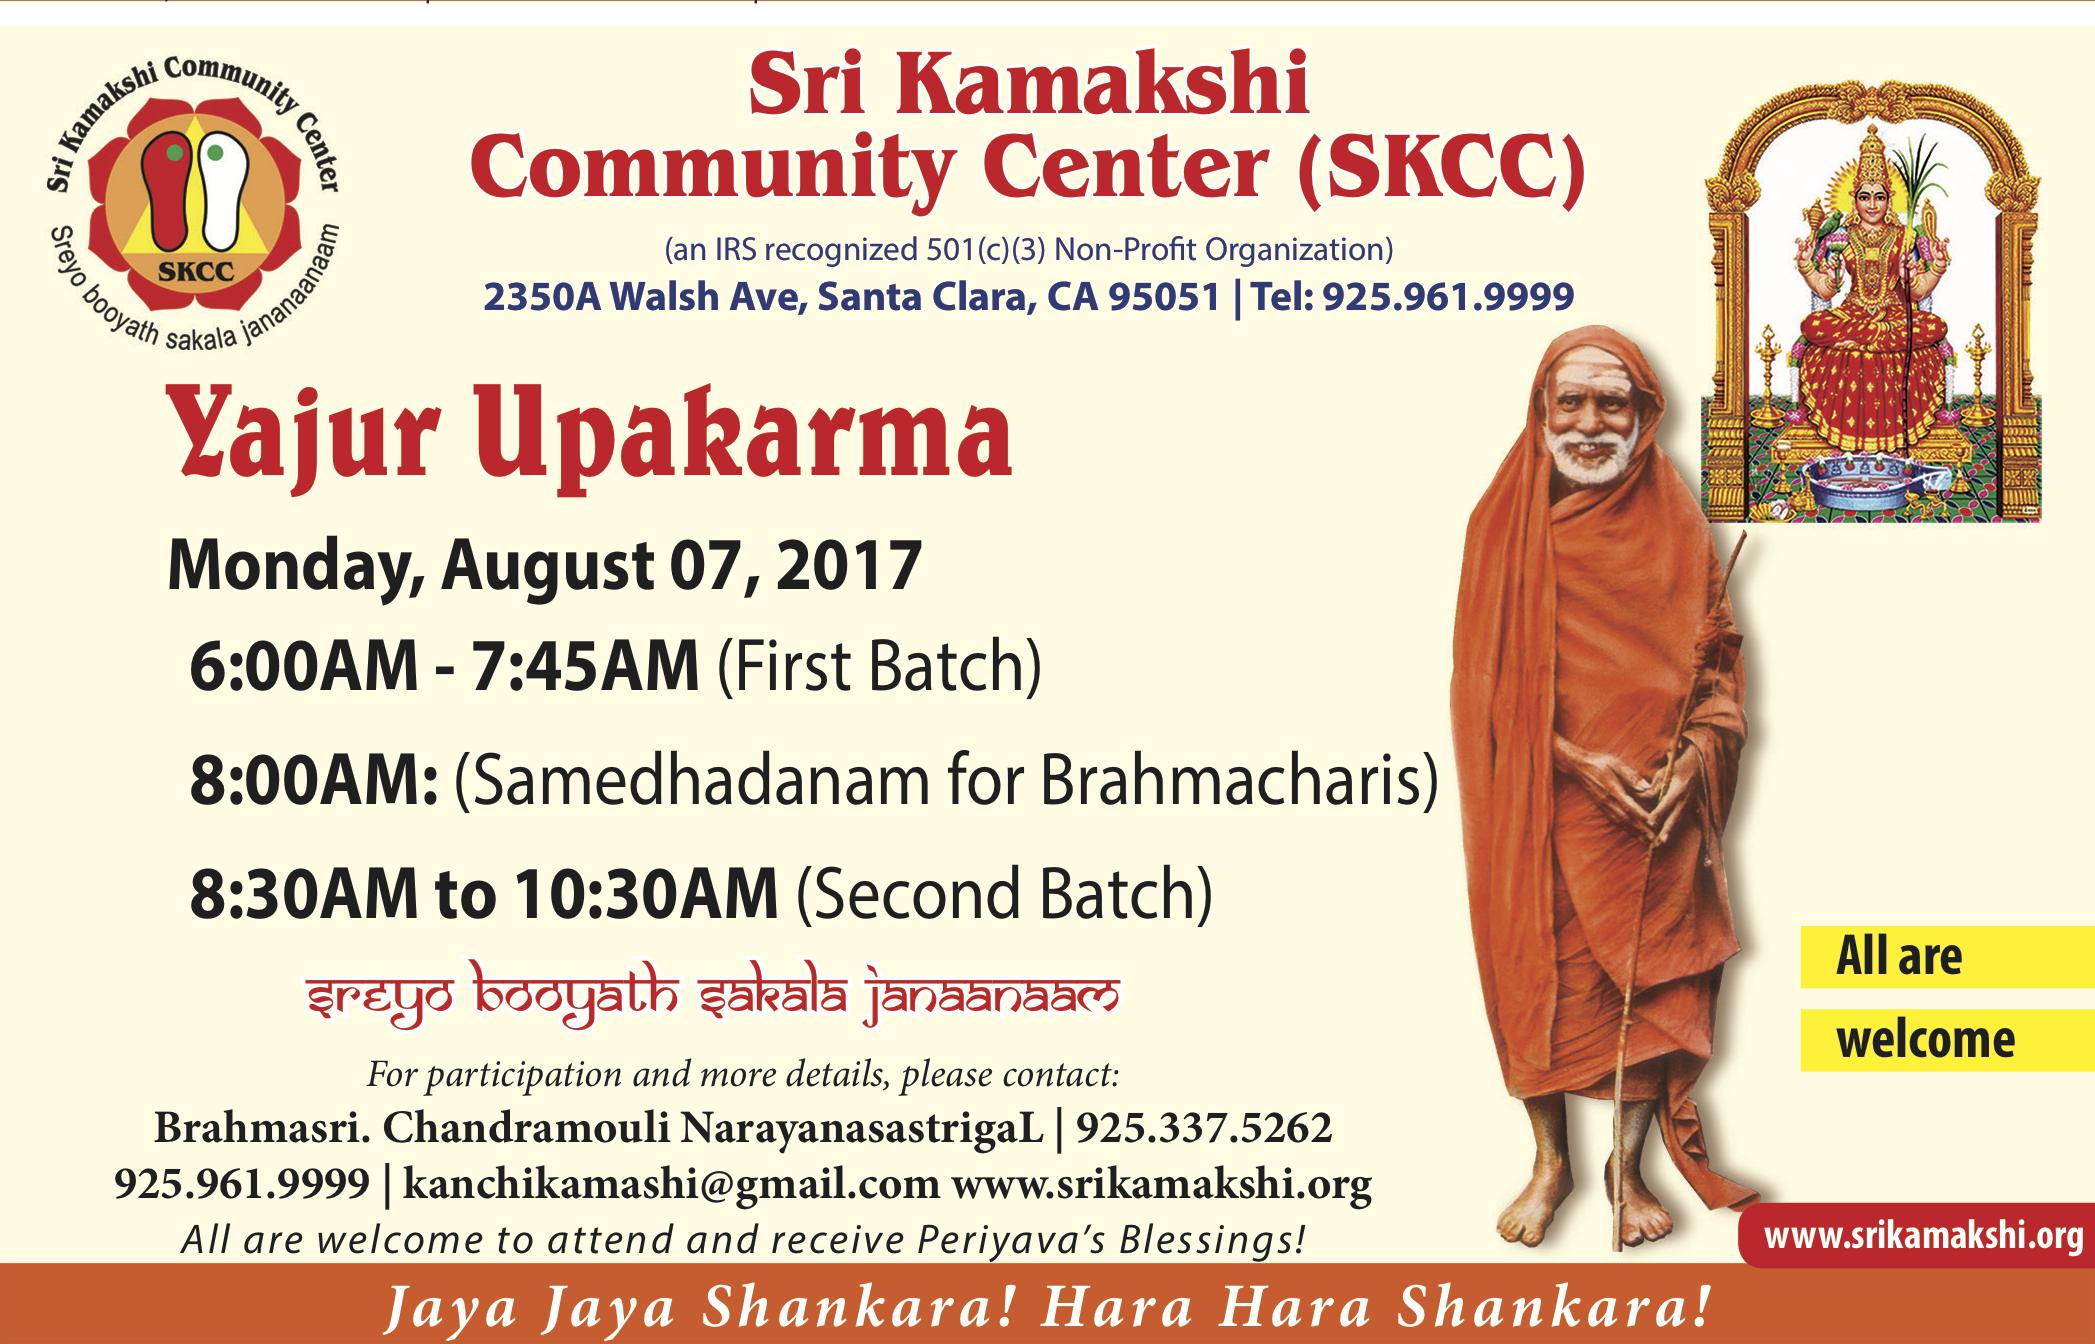 Yajur Veda Upakarma @ Sri Kamakshi Community Center